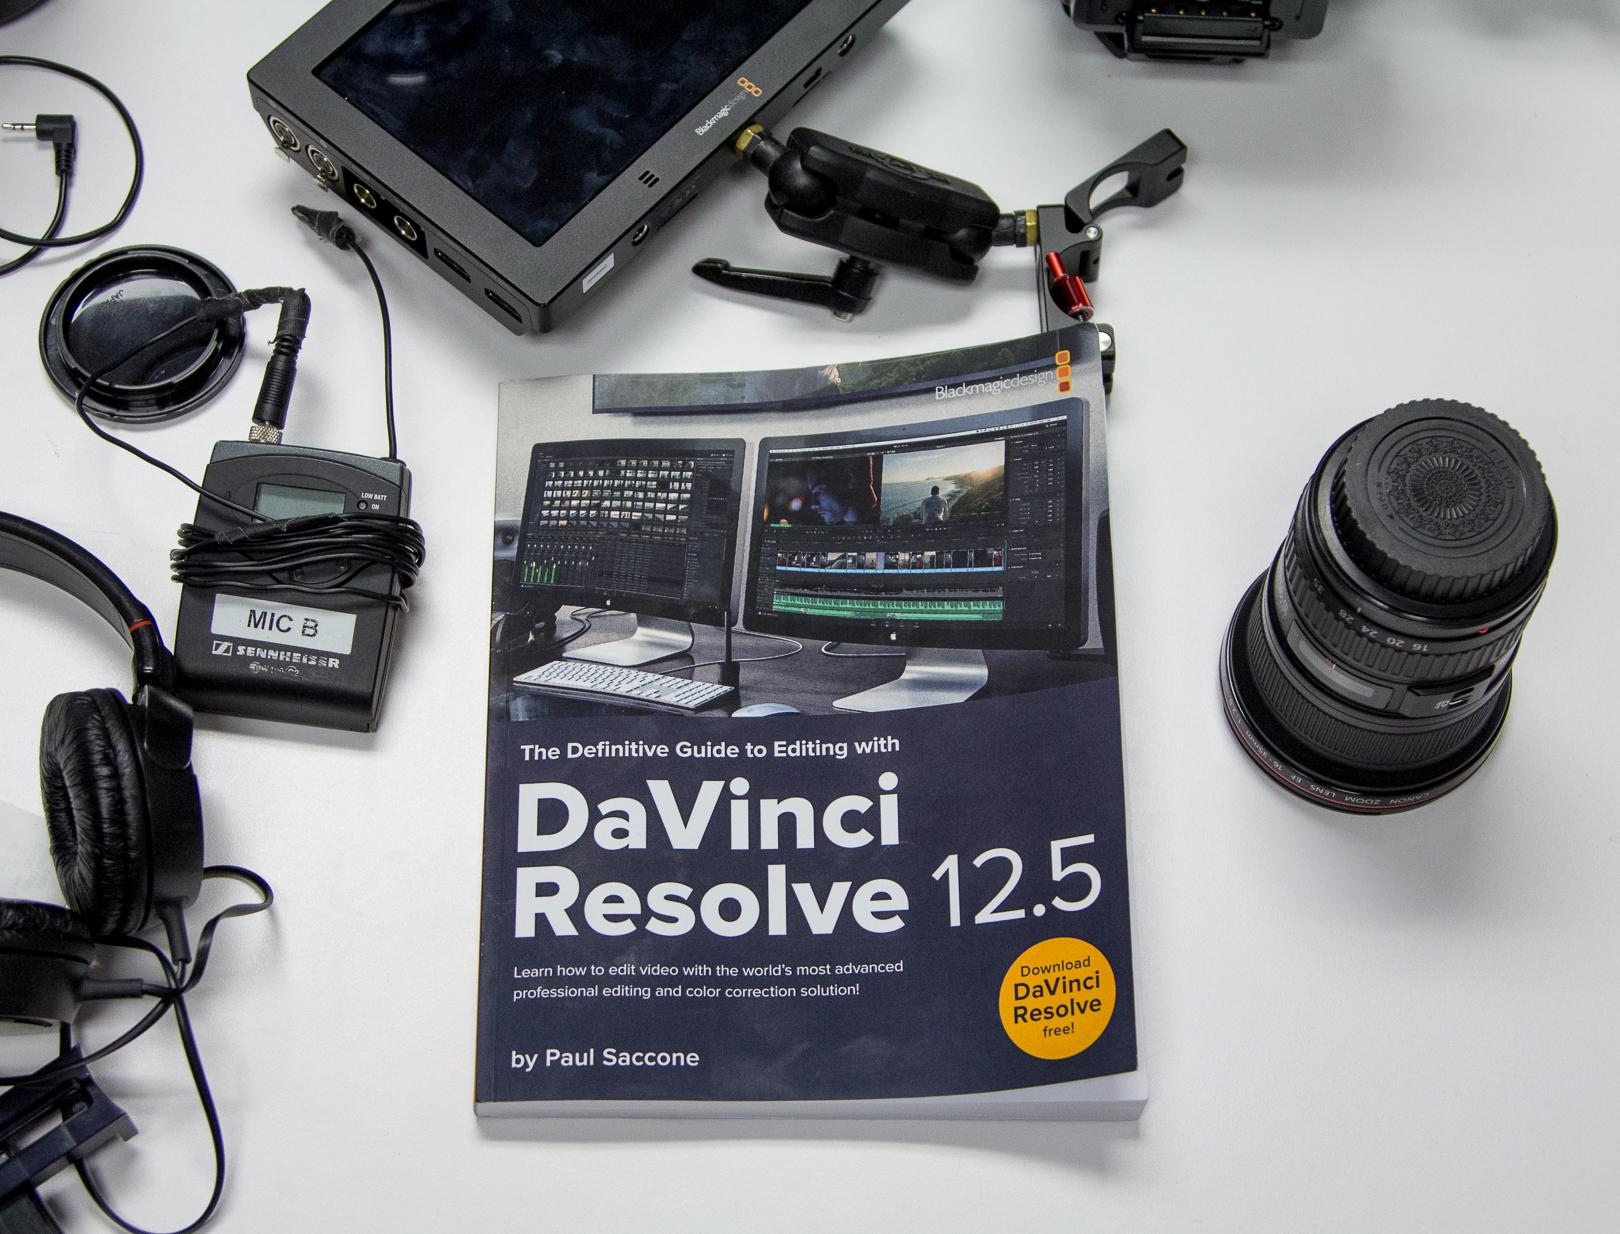 DaVinci Resolve 12.5 Editing Book Review 22